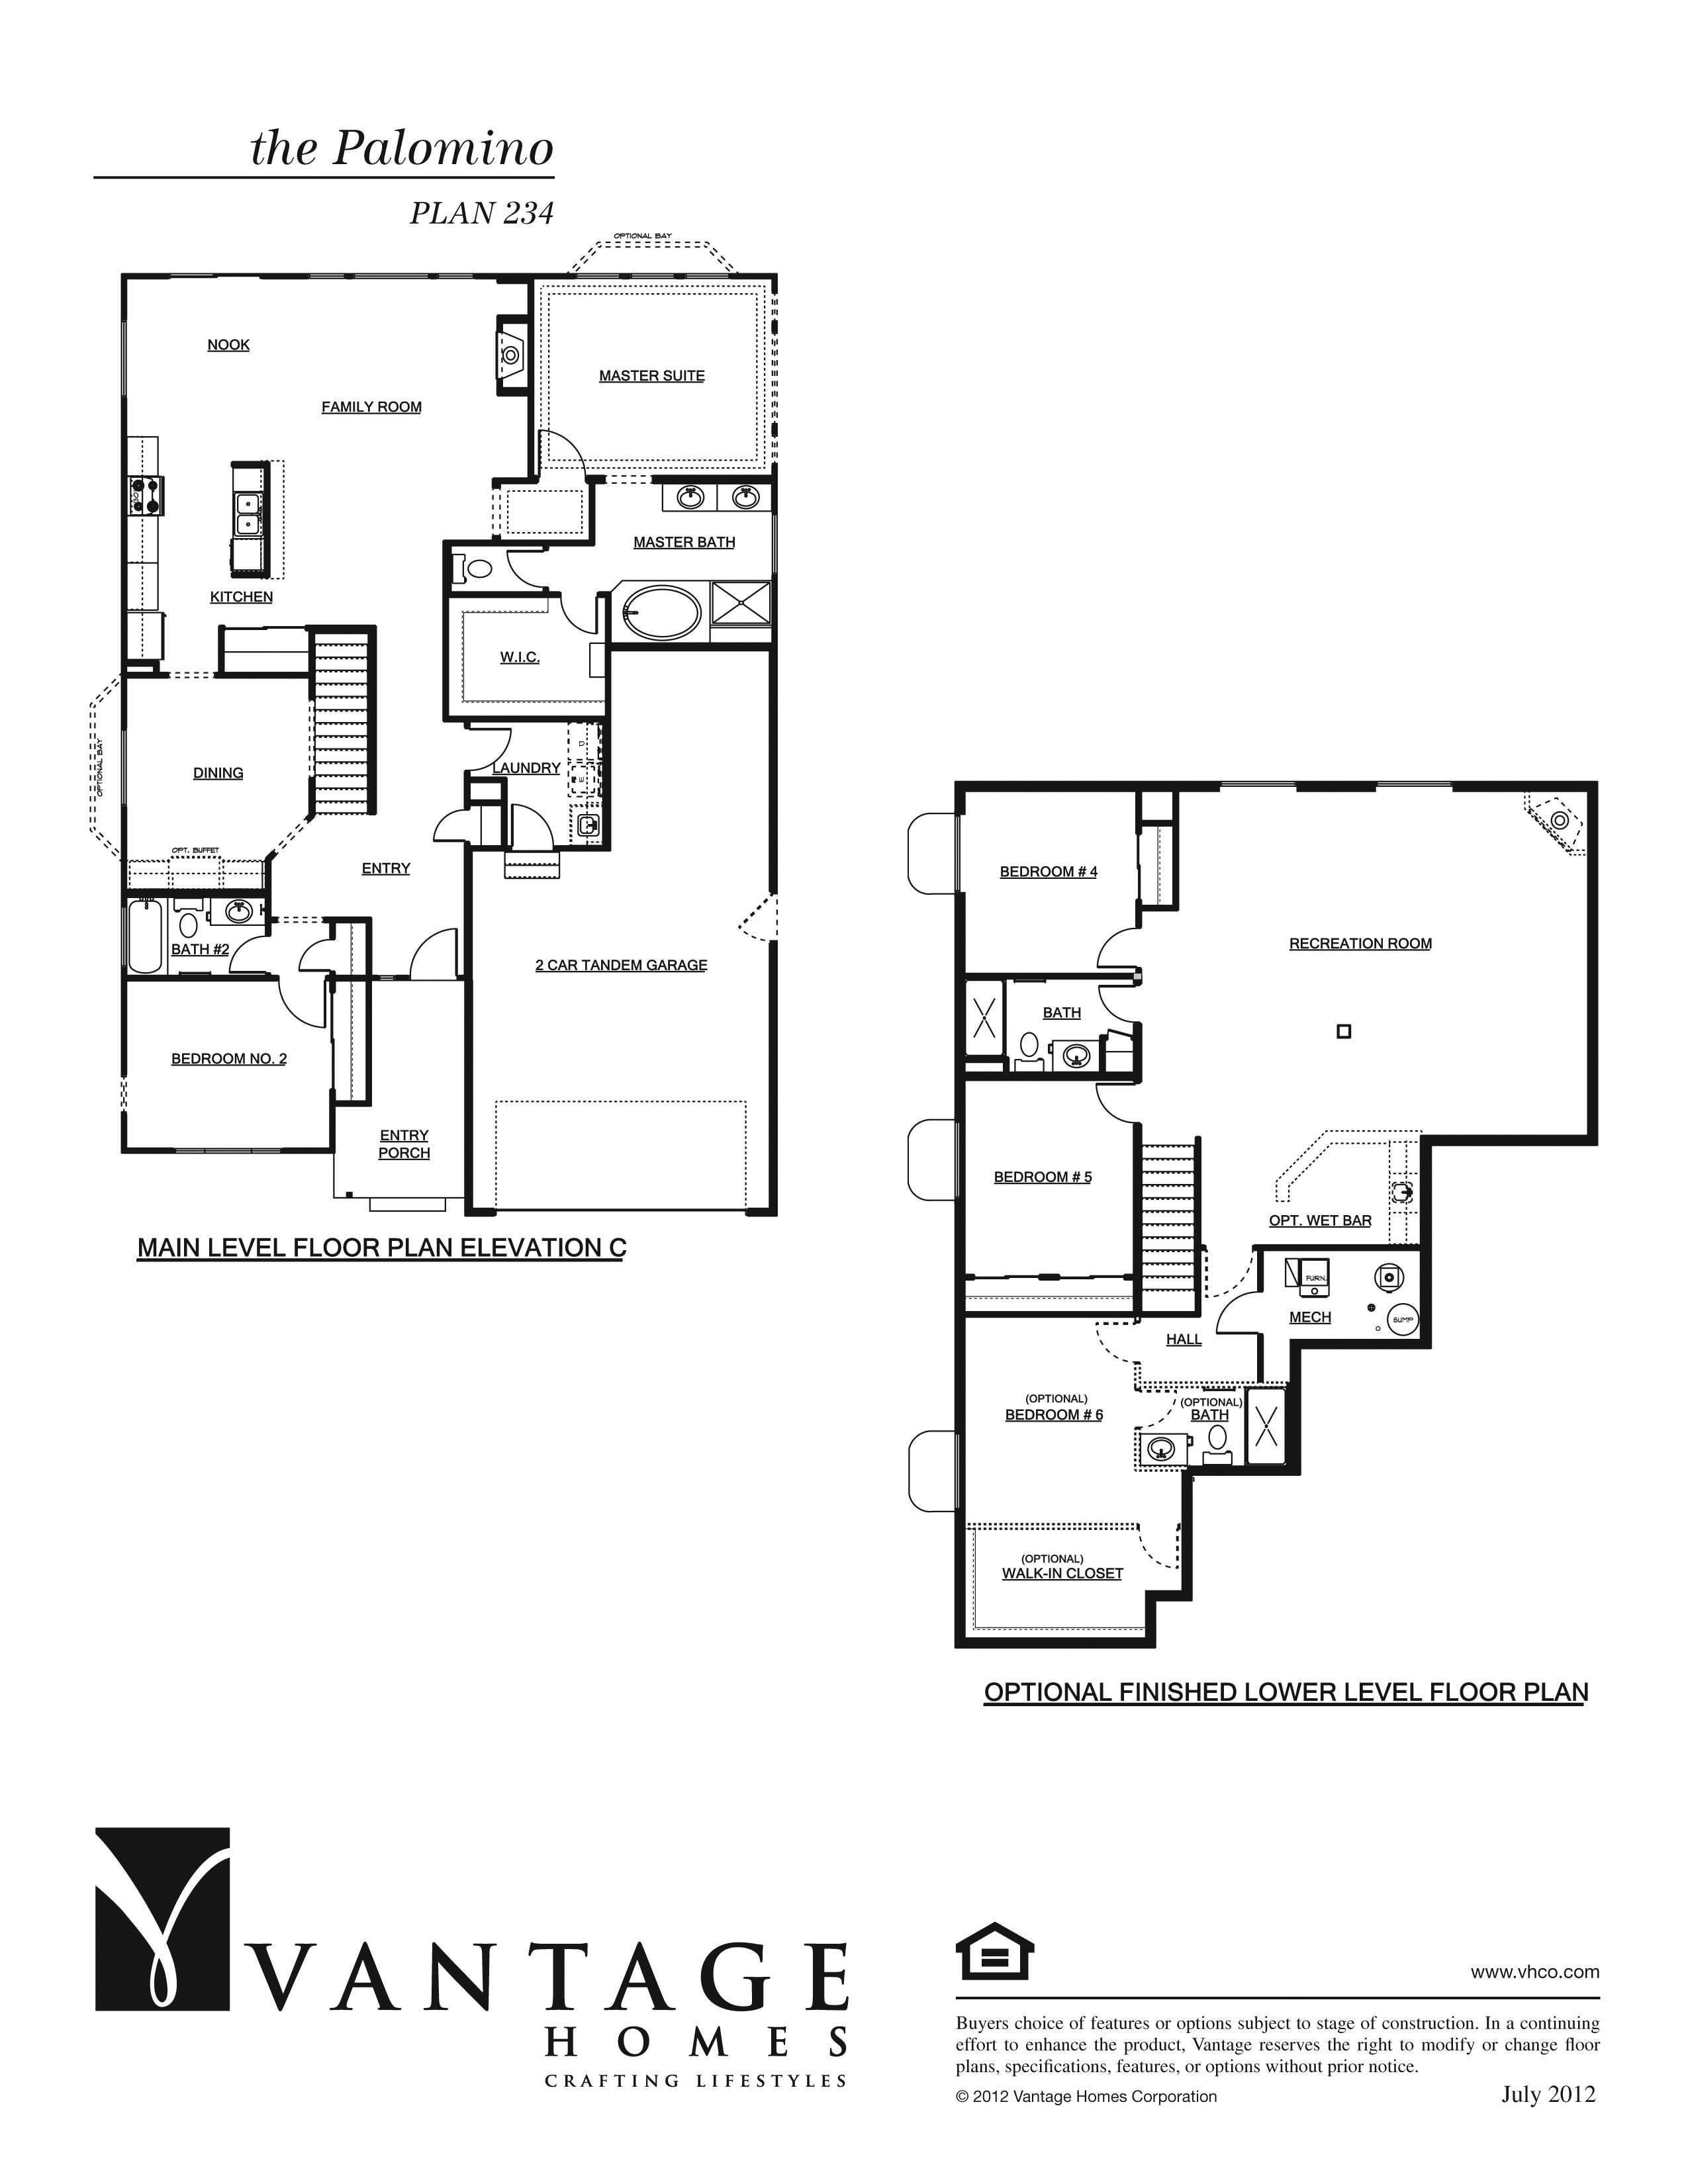 Palomino Floorplan Layout Floor Plans Space Planning House Elevation